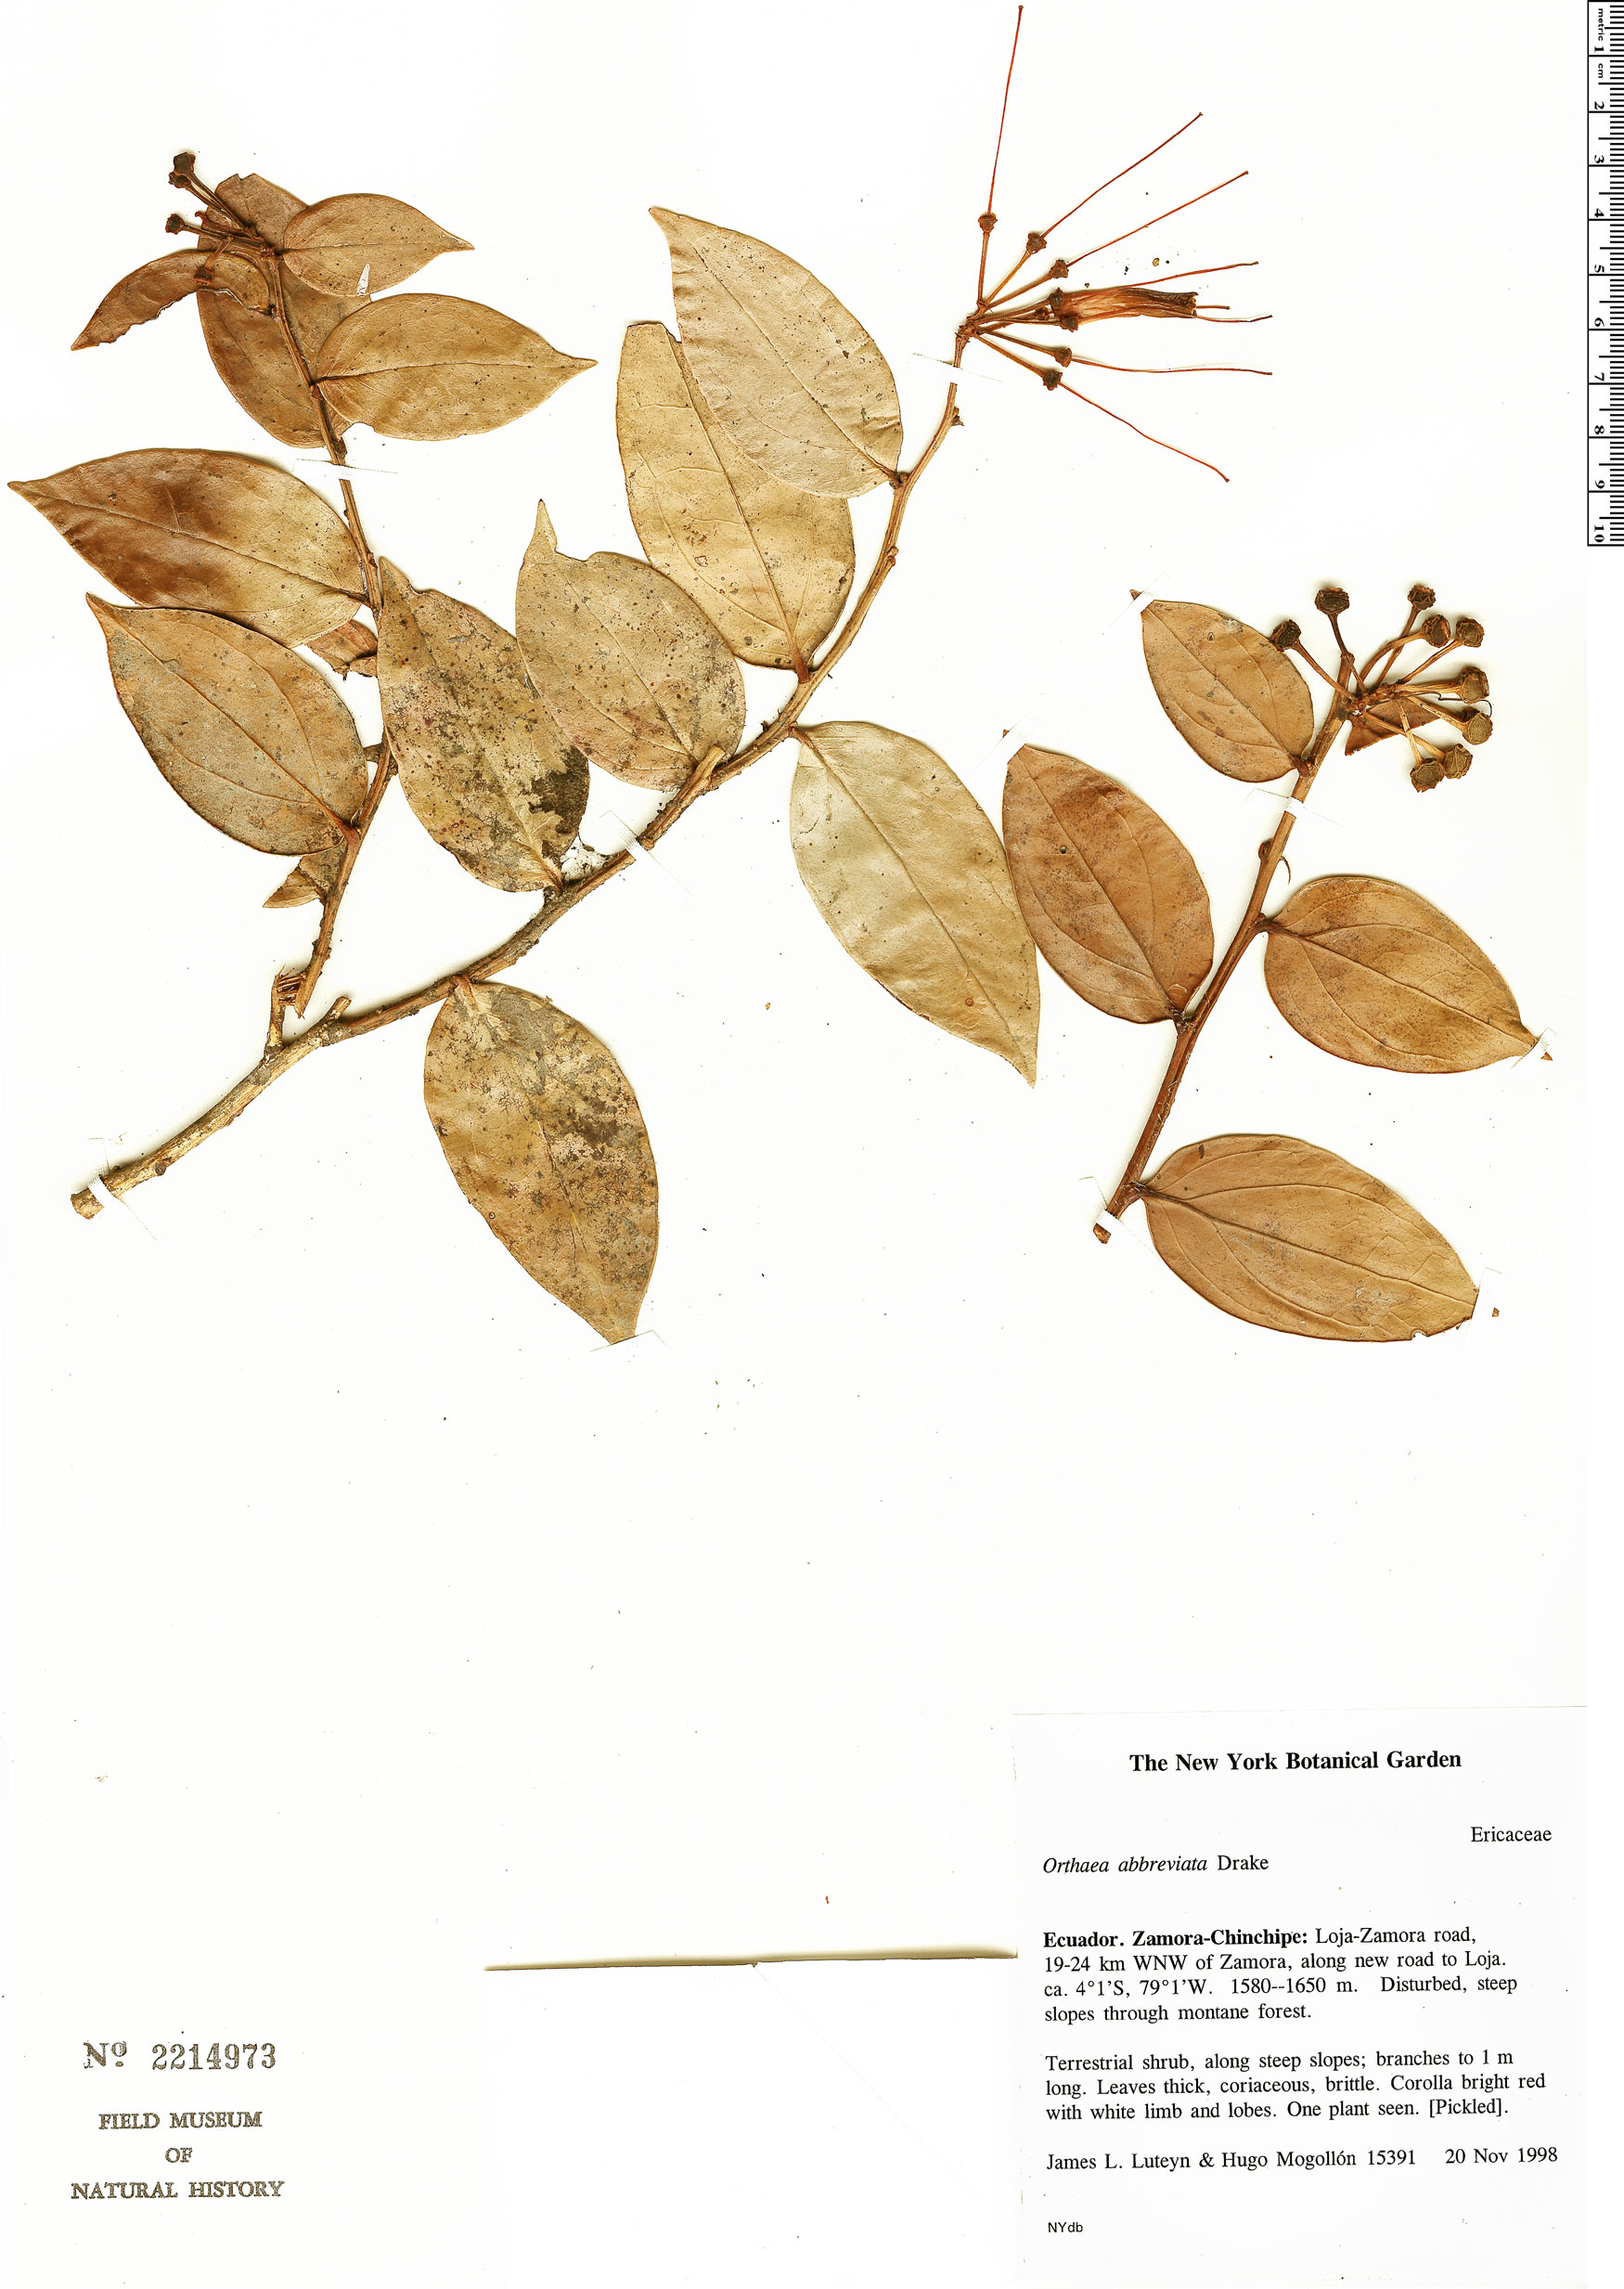 Espécime: Orthaea abbreviata